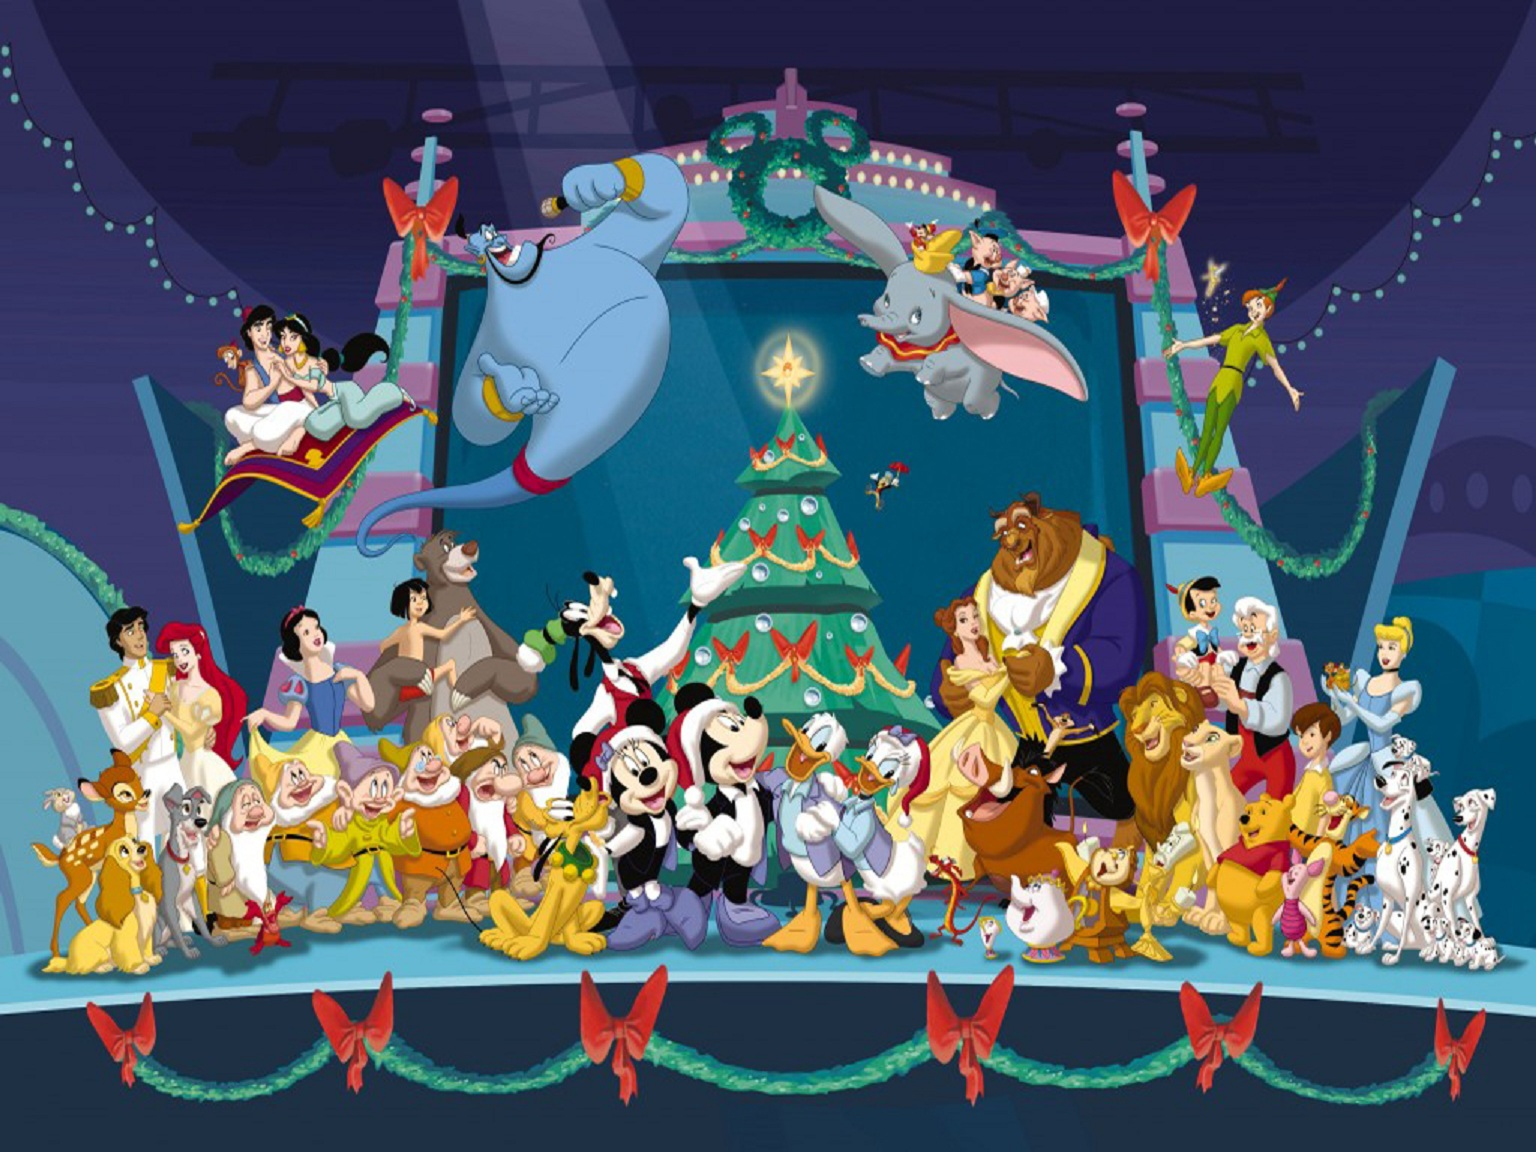 Disney HD Wallpapers: Walt Disney Cartoon HD Wallpapers